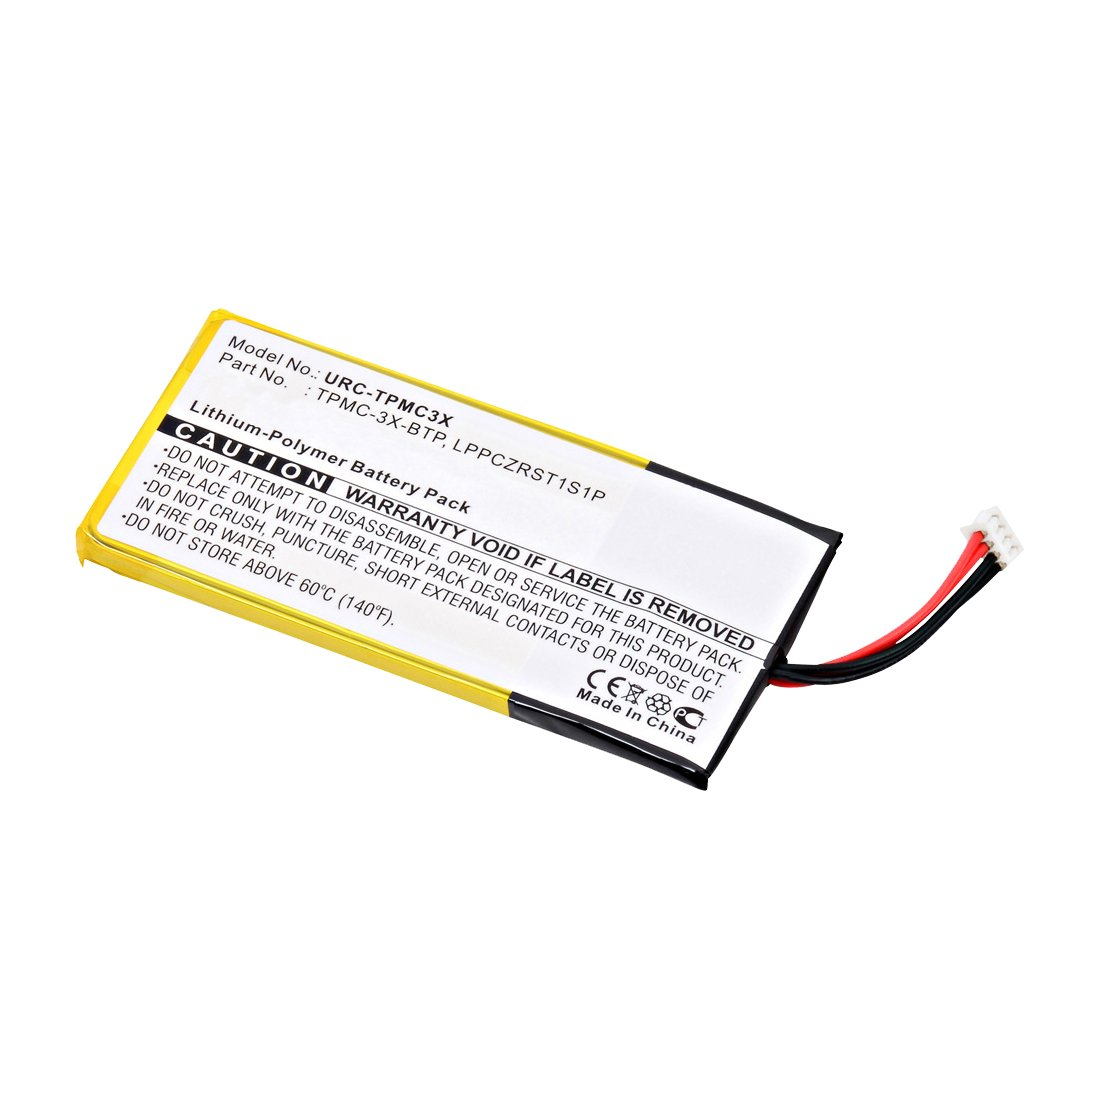 Replacement Crestron Lppczrst1s1p Remote Control Battery Batterymart